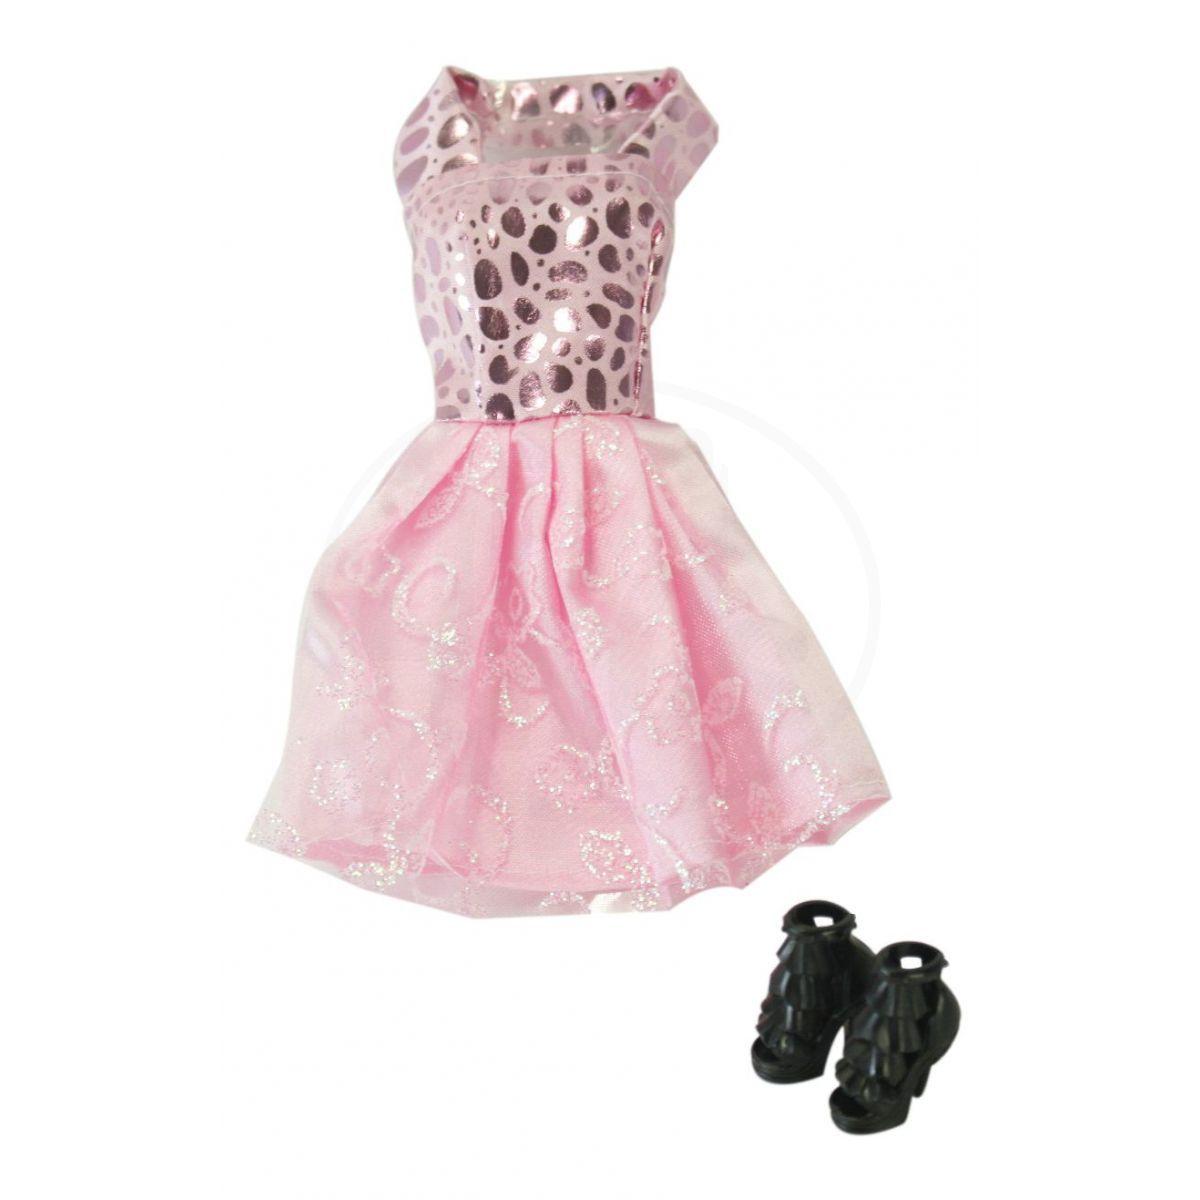 EPline Šatičky pro panenky s doplňky růžové šaty fc20799382